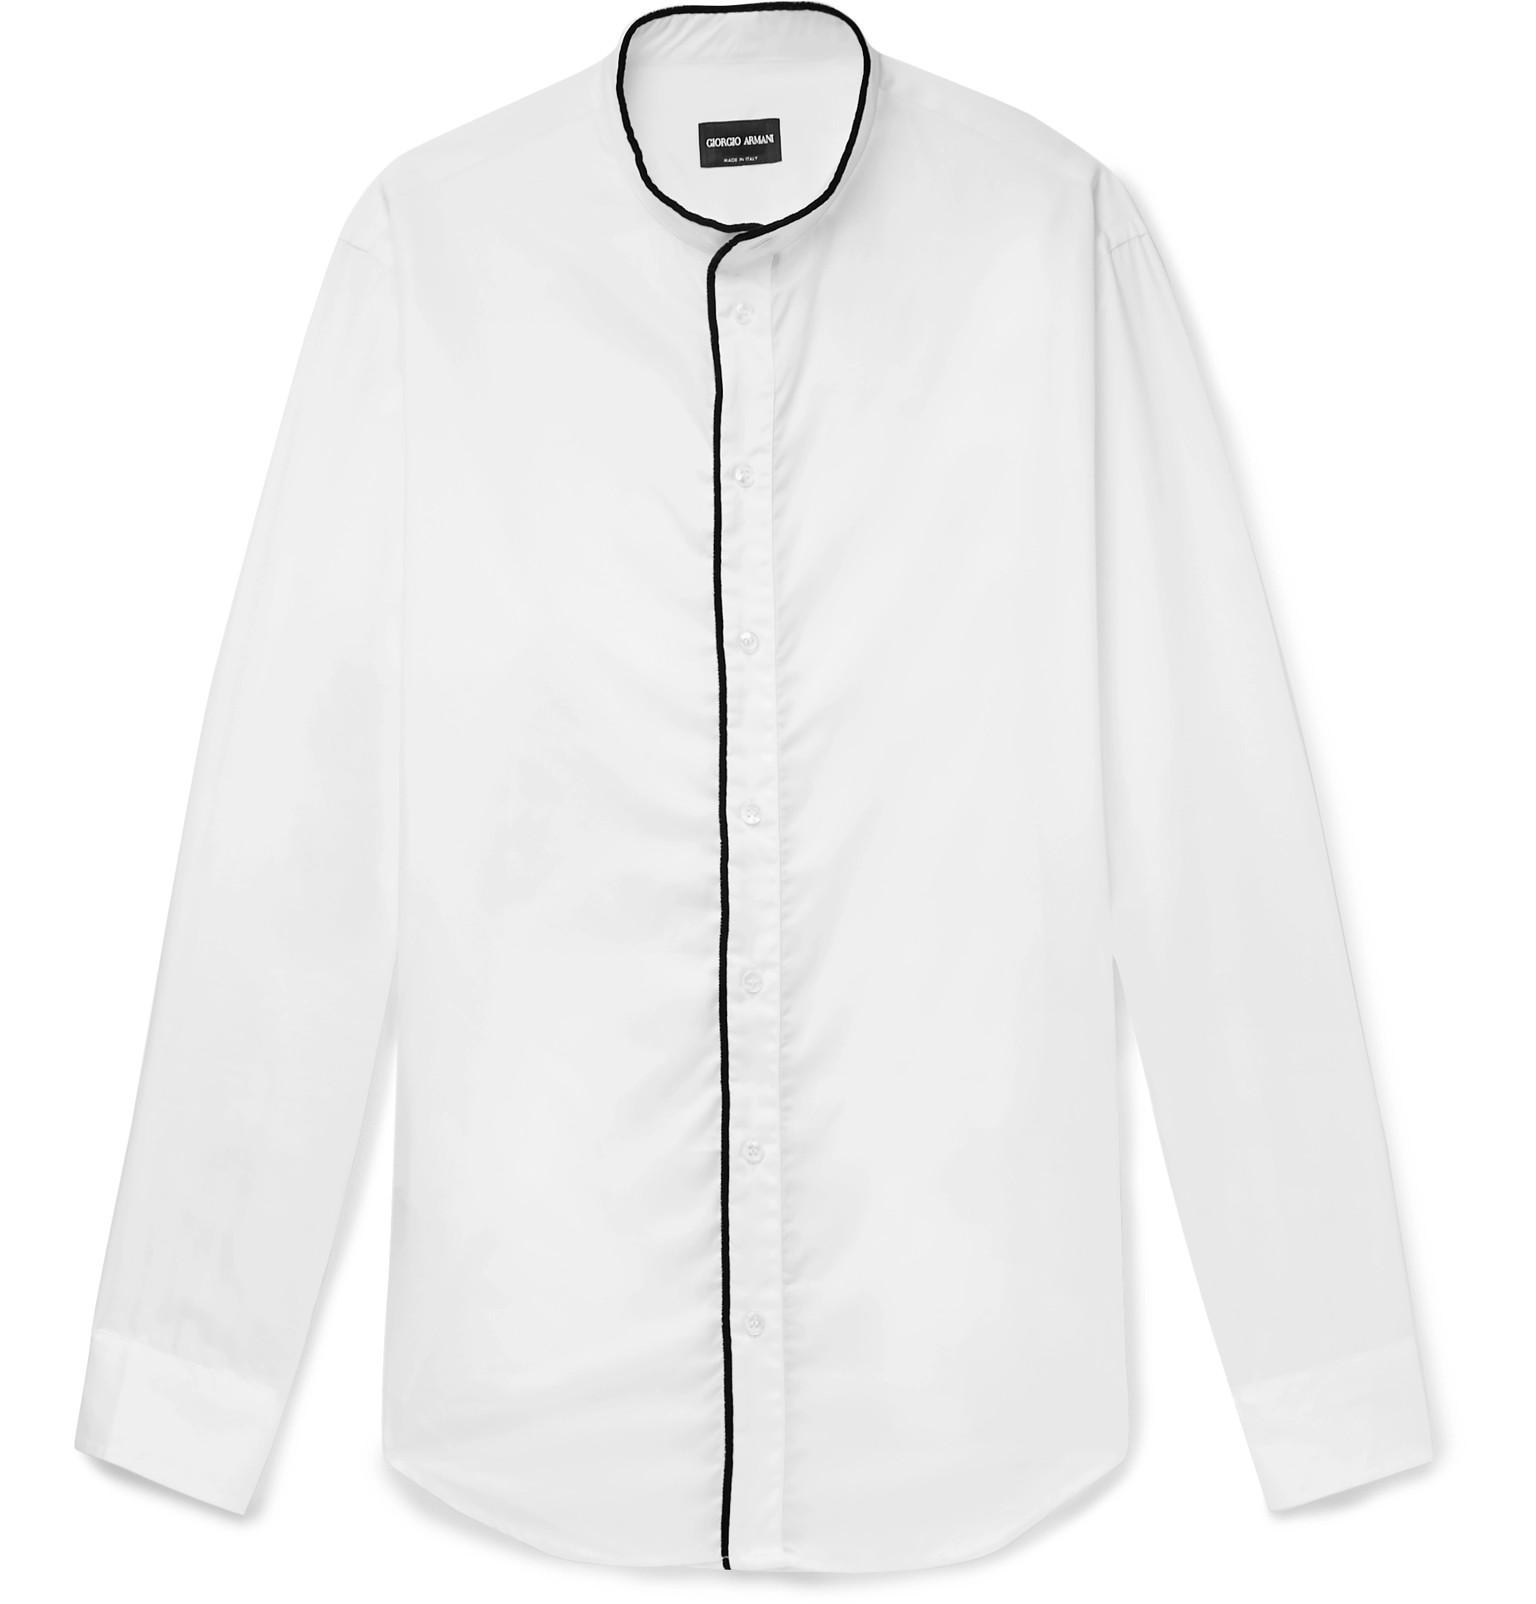 87dab8d9362 giorgio-armani-white-Slim-fit-Grandad-collar -Contrast-tipped-Cotton-Shirt.jpeg